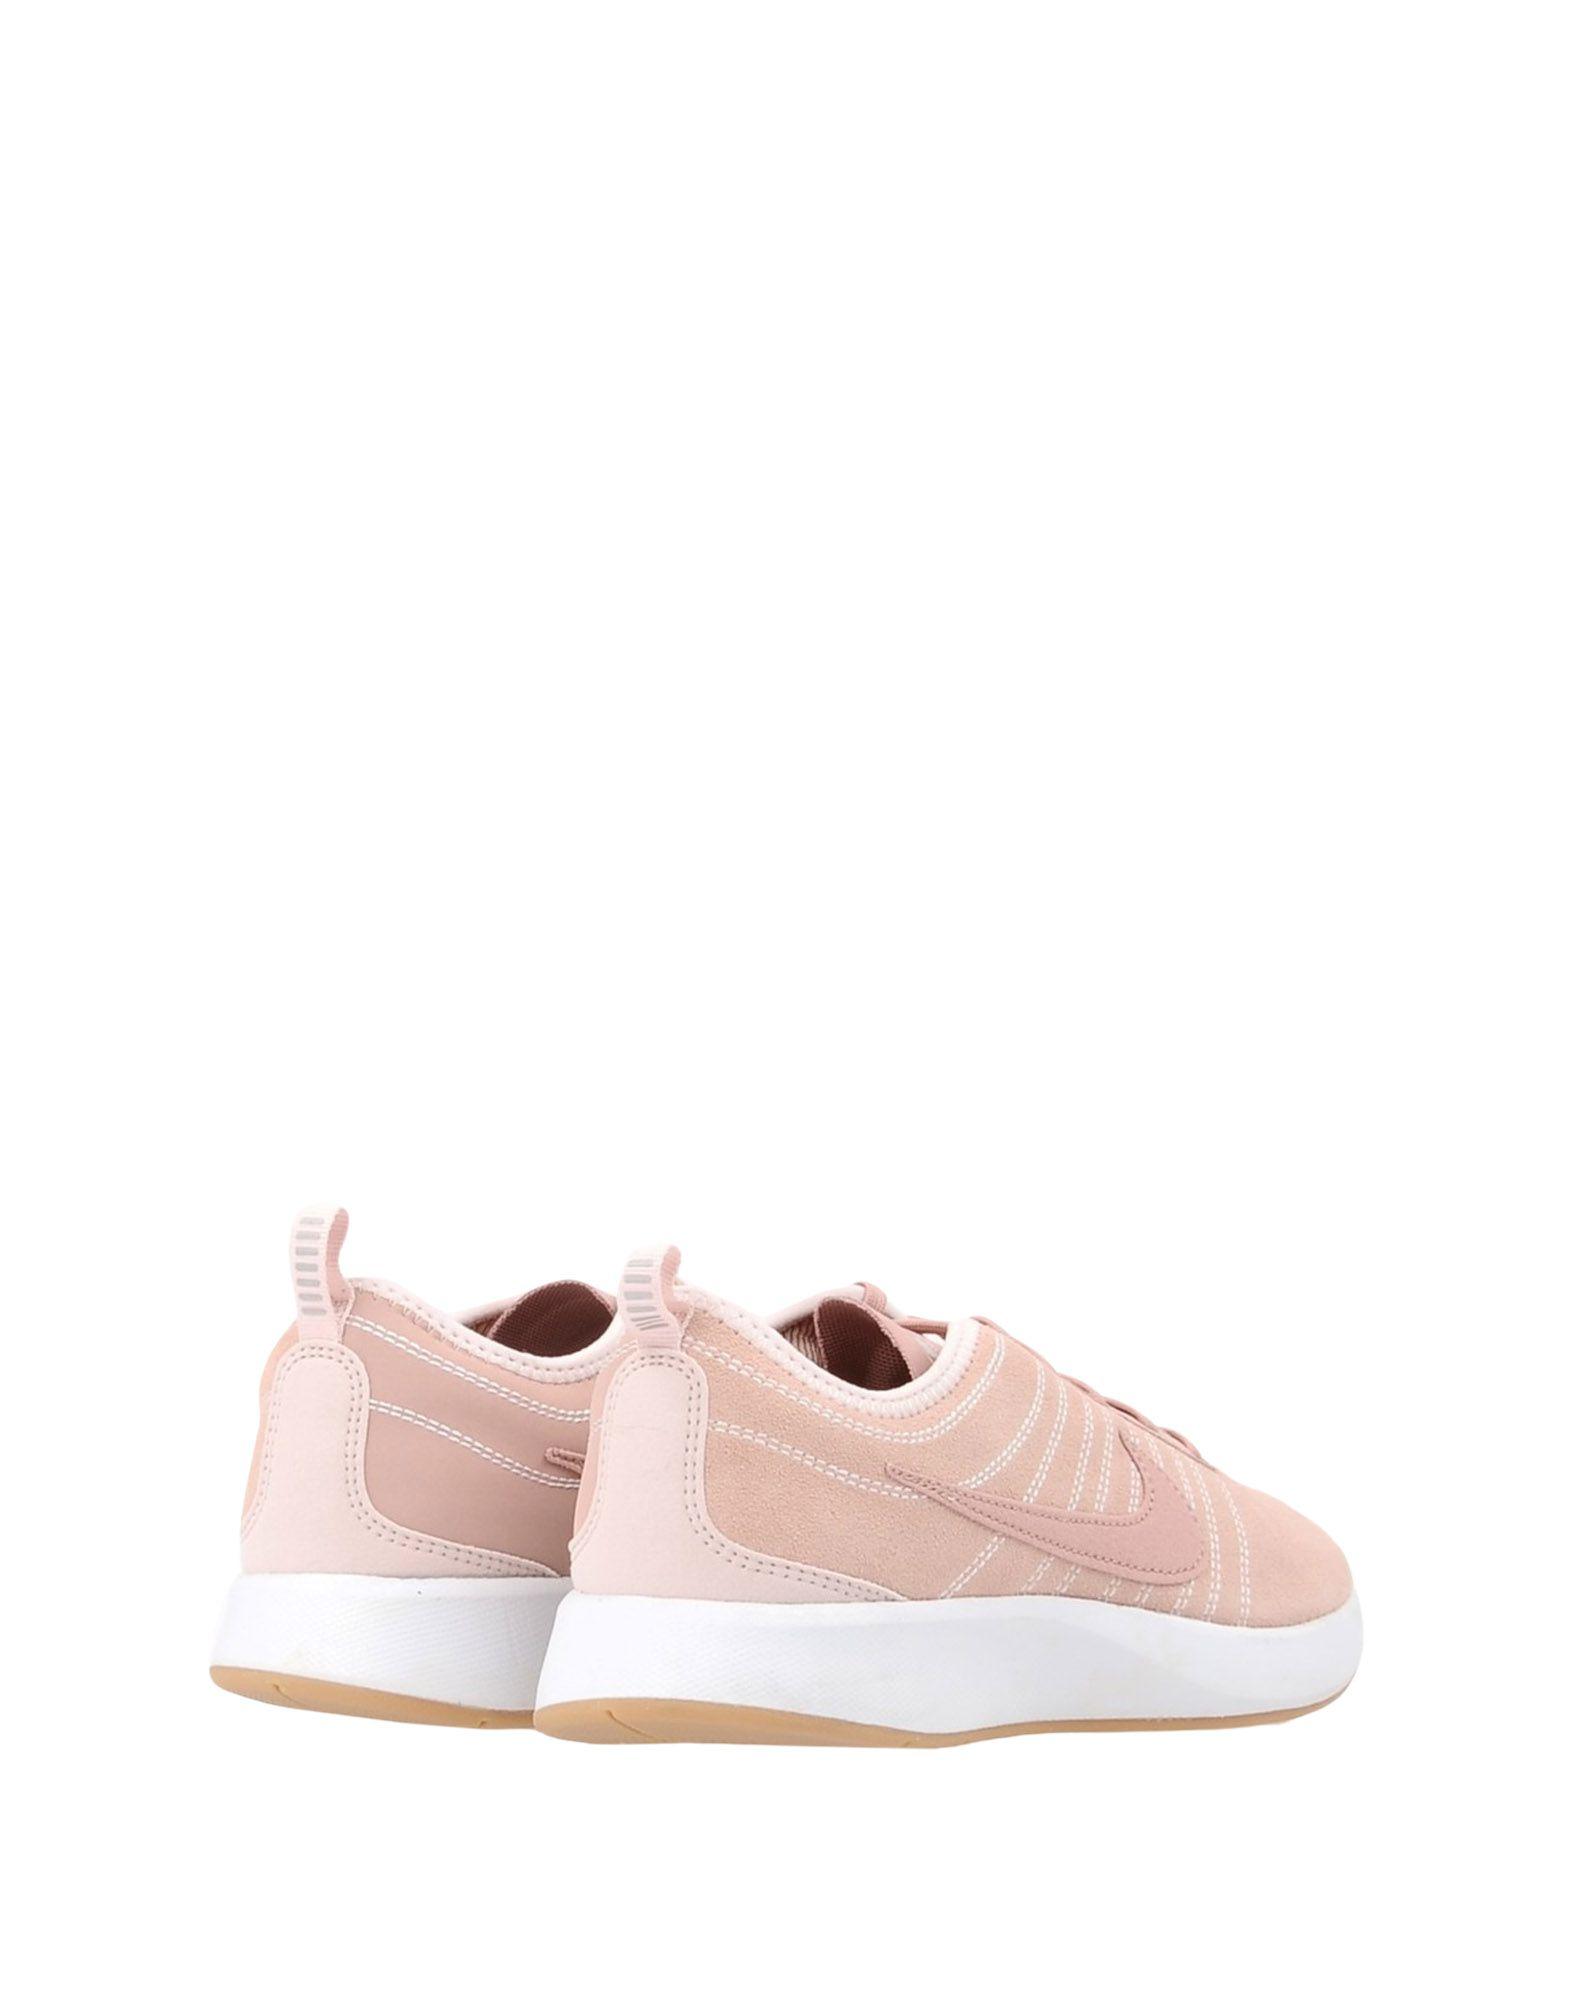 Sneakers Nike  Dualtone Racer Se - Femme - Sneakers Nike sur